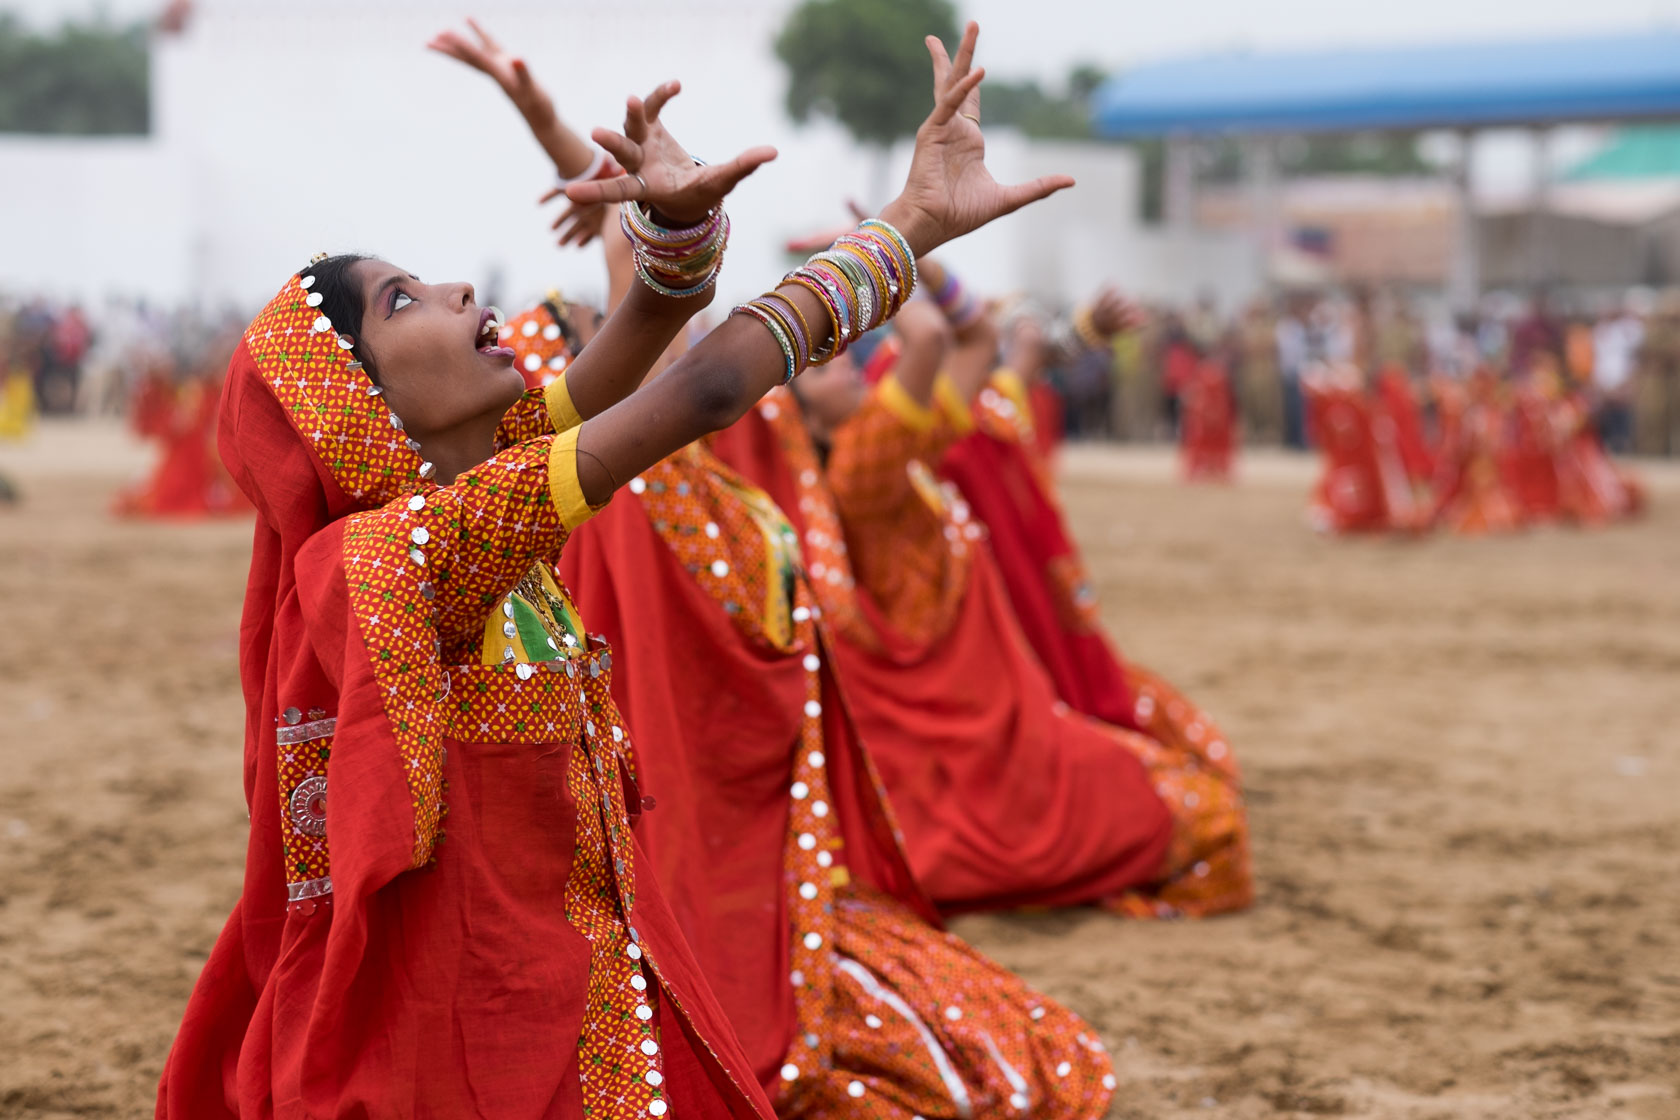 Traditional Dancers, Rajasthan, India